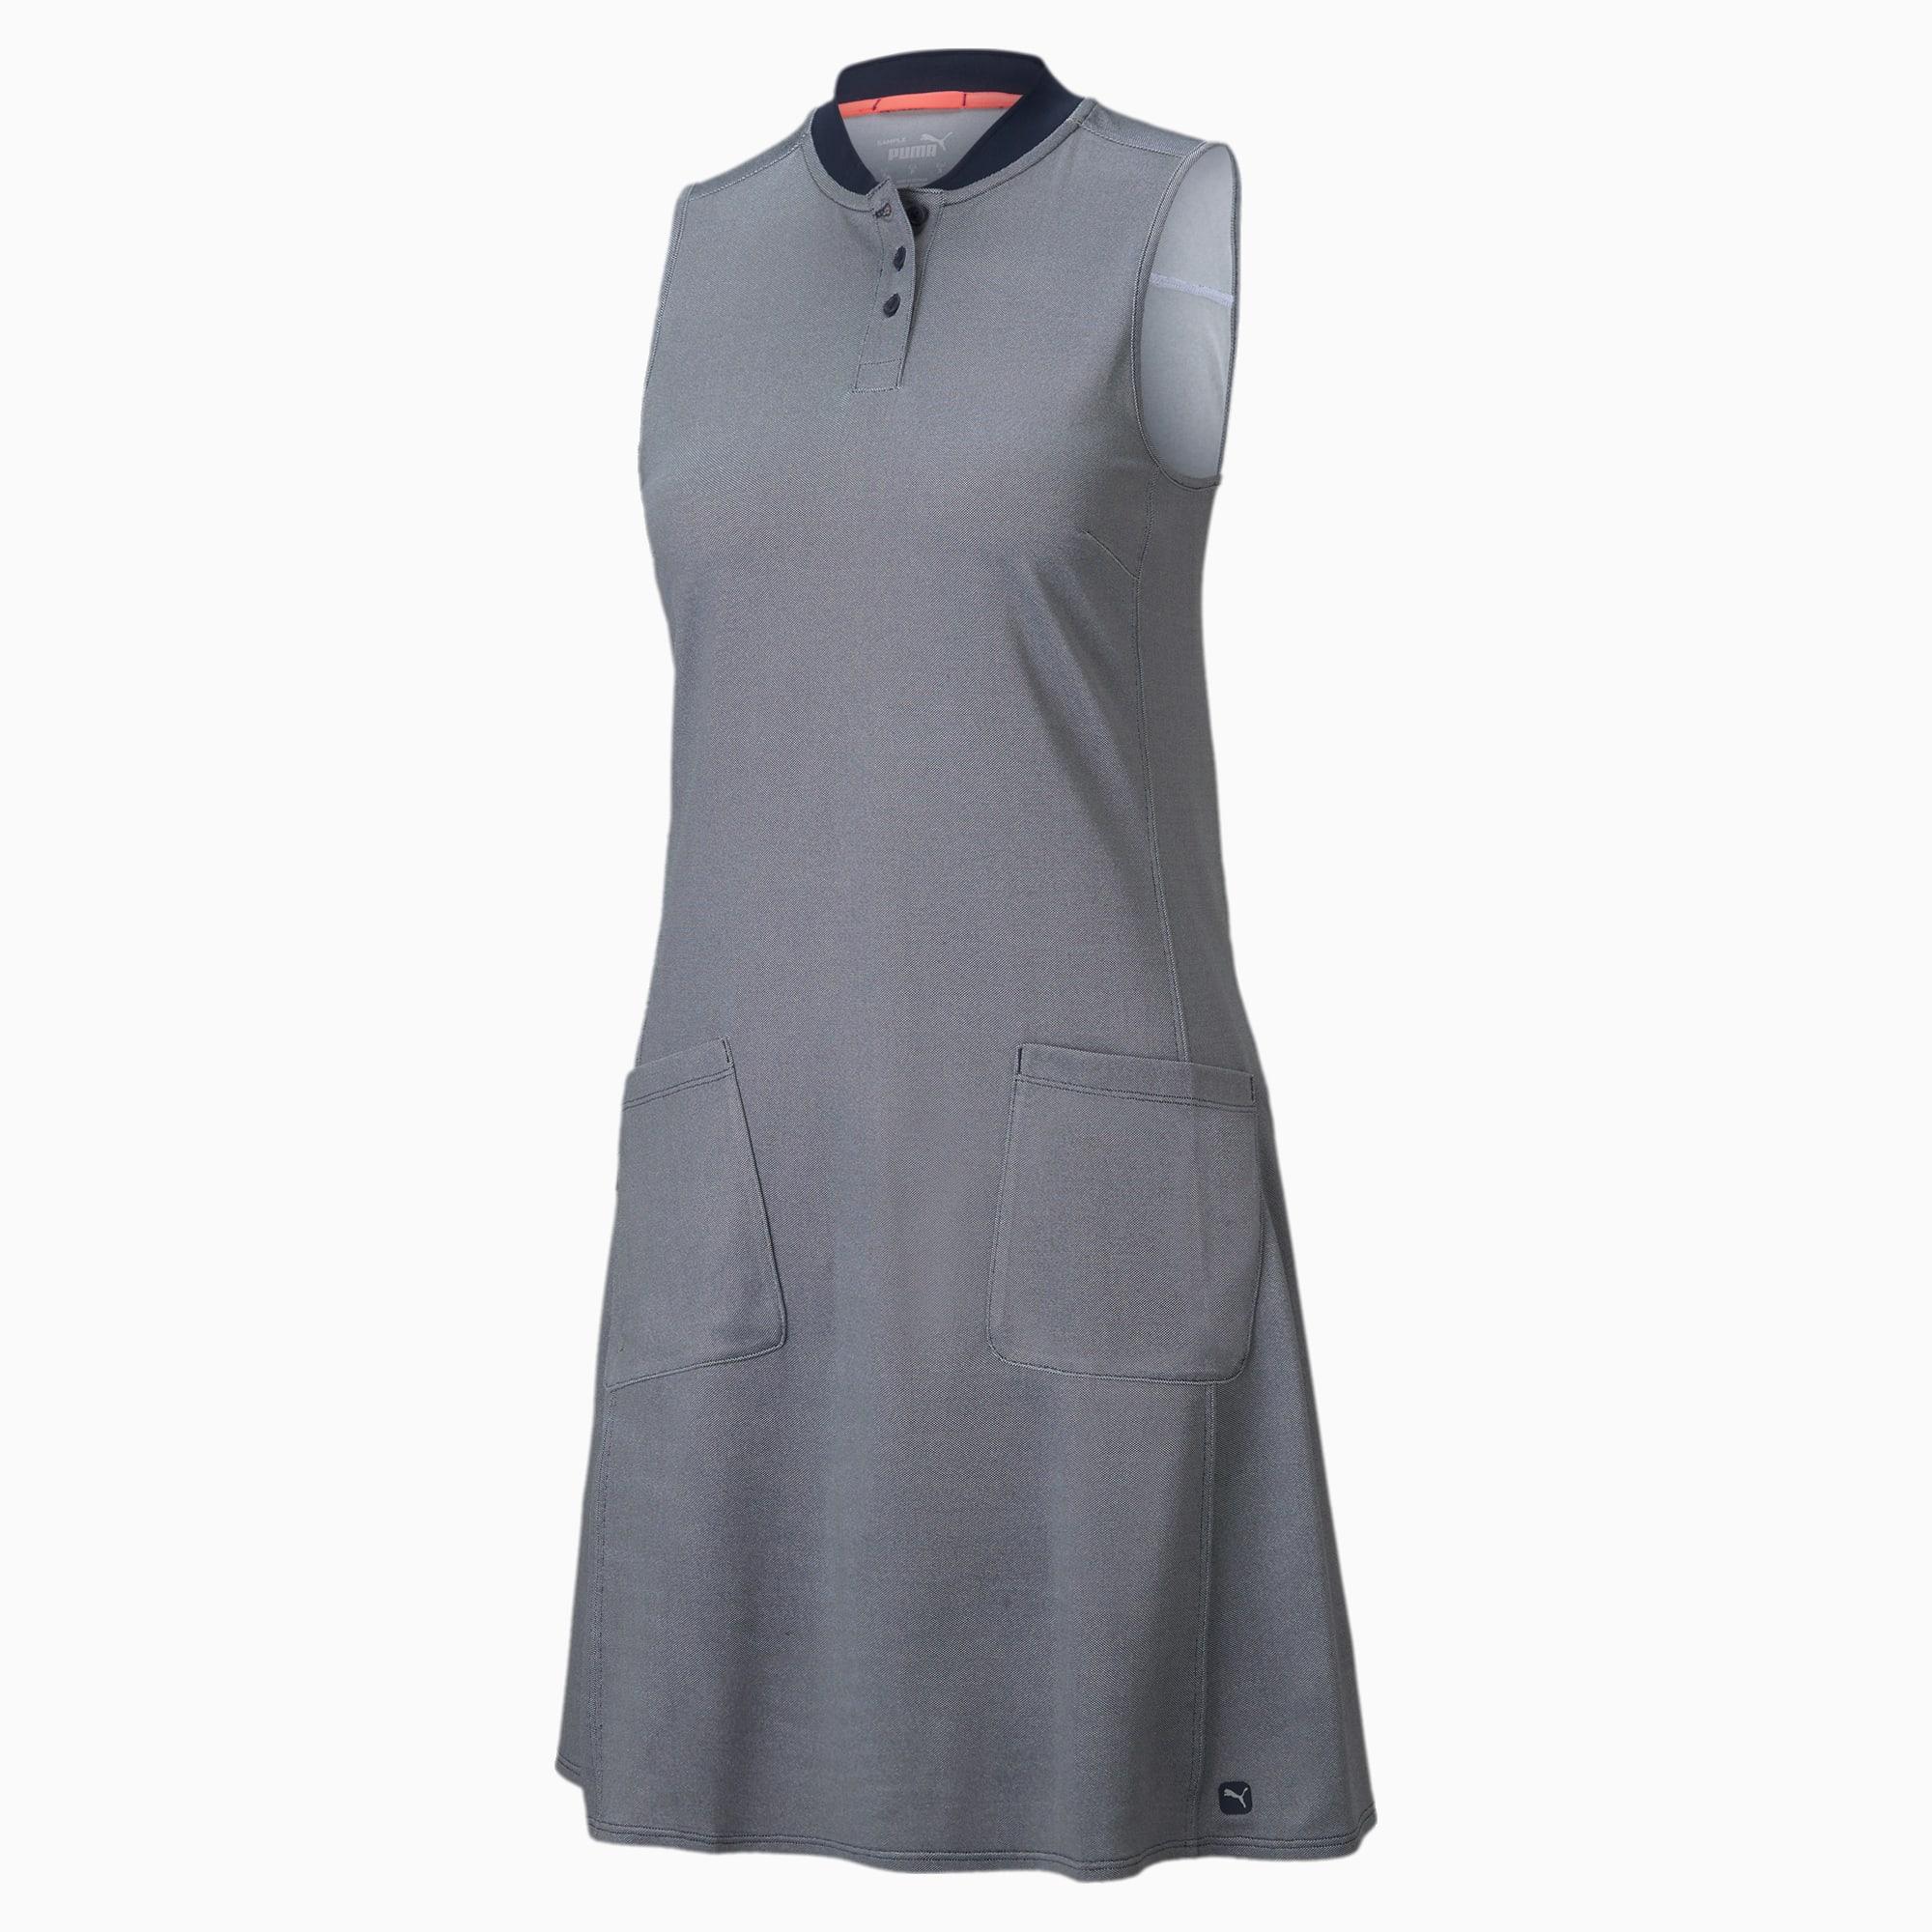 Robe de golf Farley , Bleu, Taille L, Vêtements - PUMA - Modalova